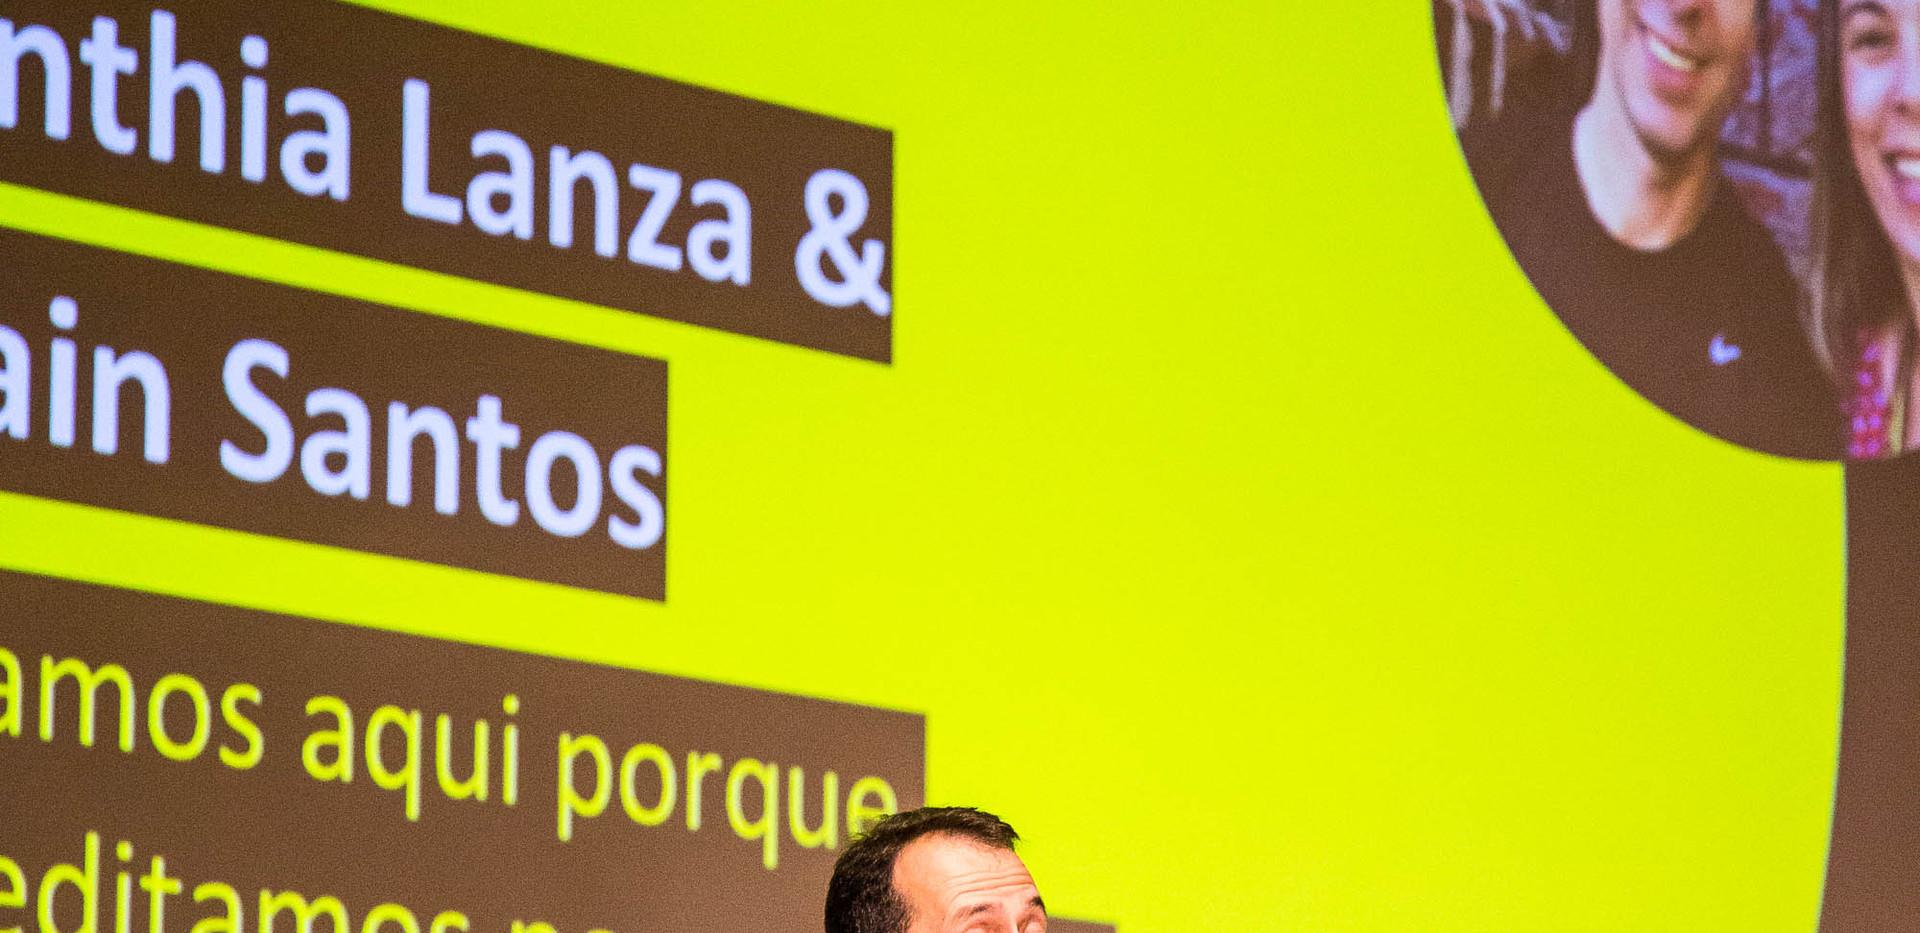 Brazil-FloridaStudentConference-66.jpg